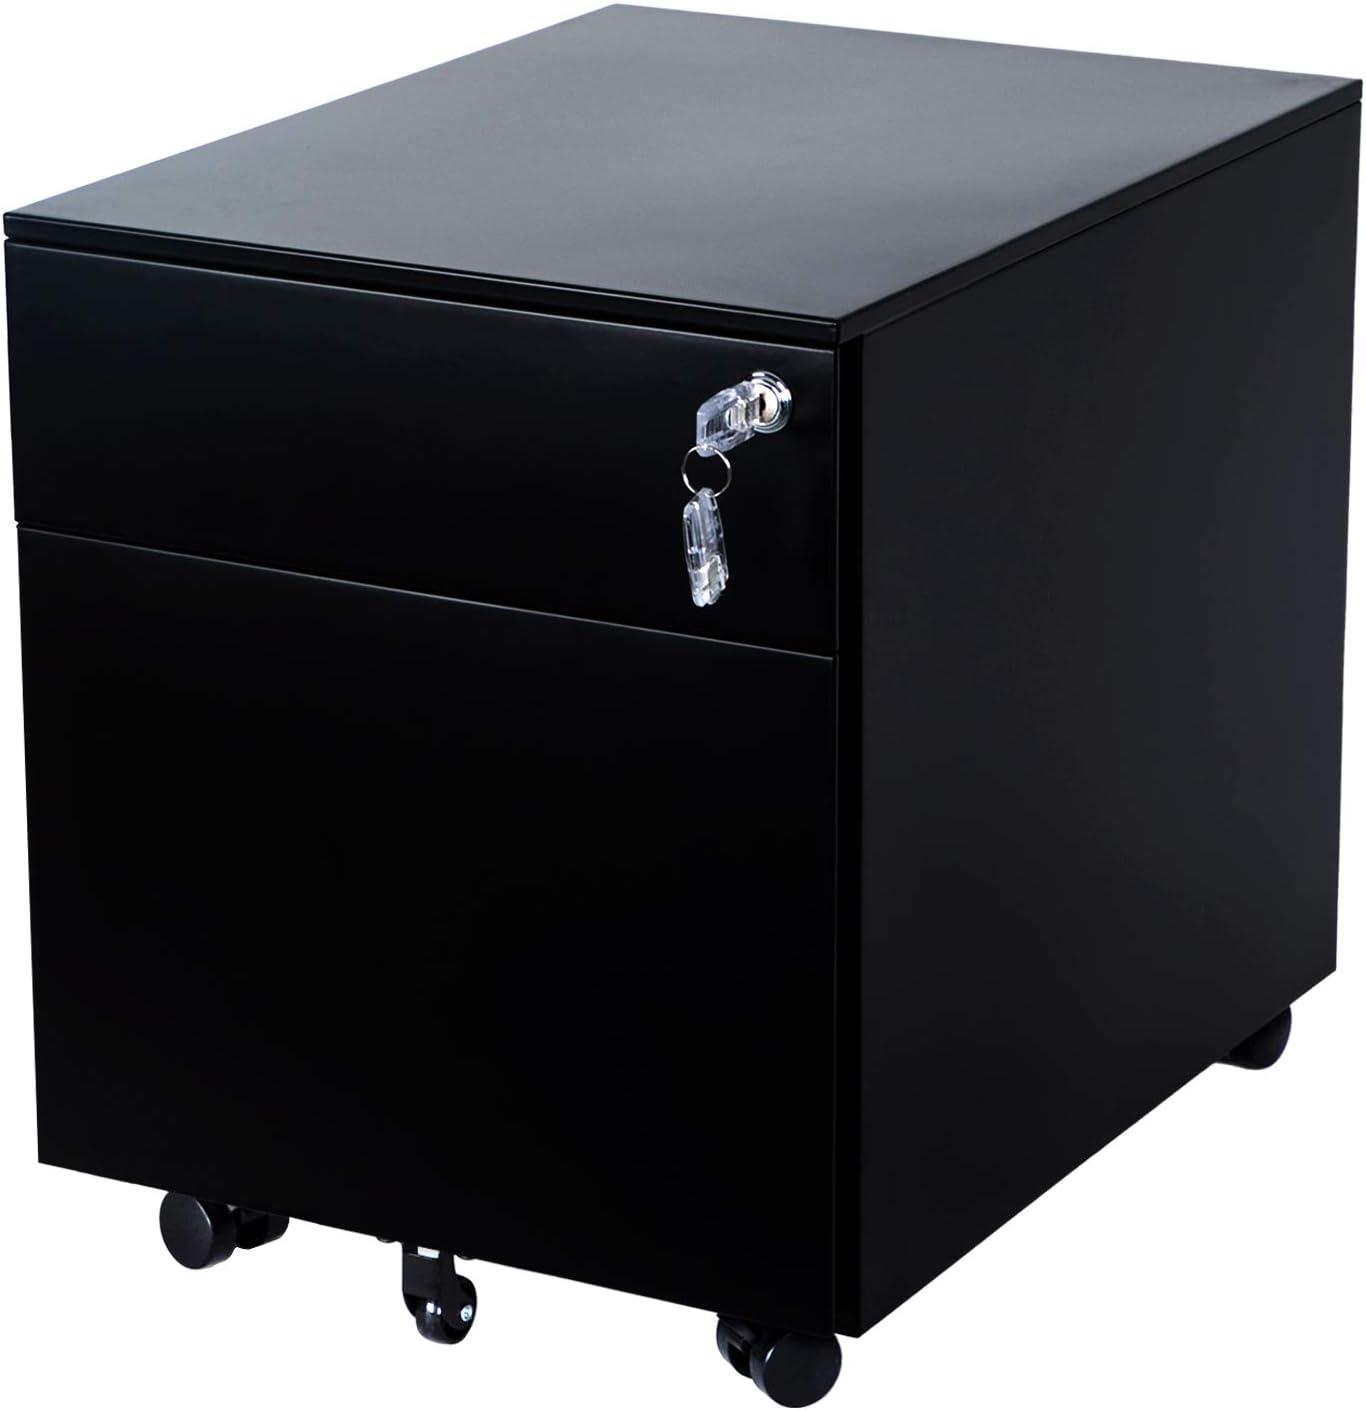 AIMEZO 2-Drawer Mobile File Cabinet Under Desk Storage for Home Office, Fully Assembled Black